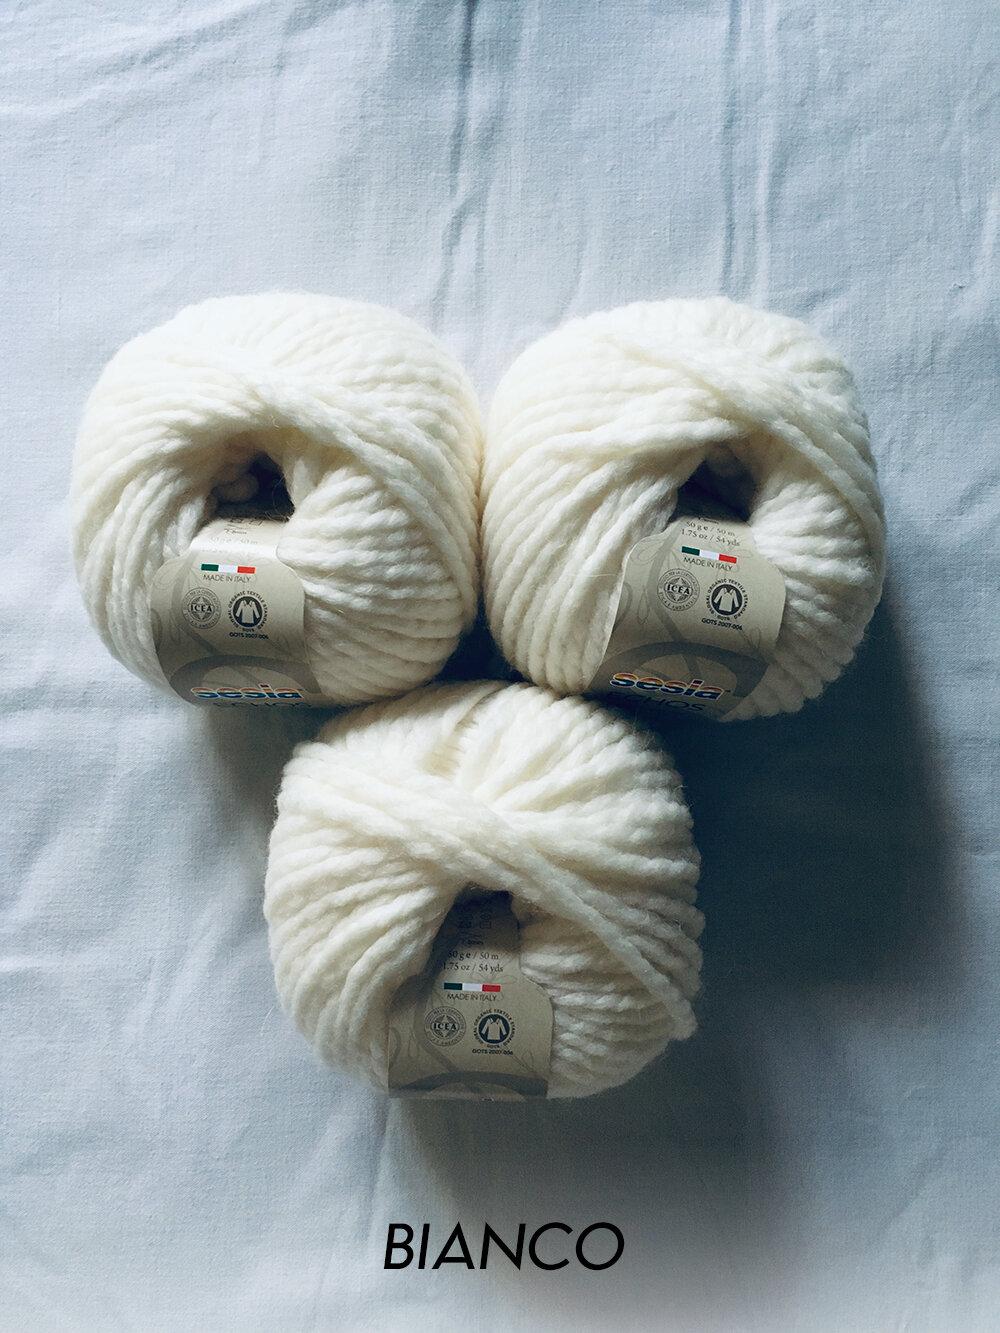 sesia_echos_bianco_207_wool_done_knitting.jpg